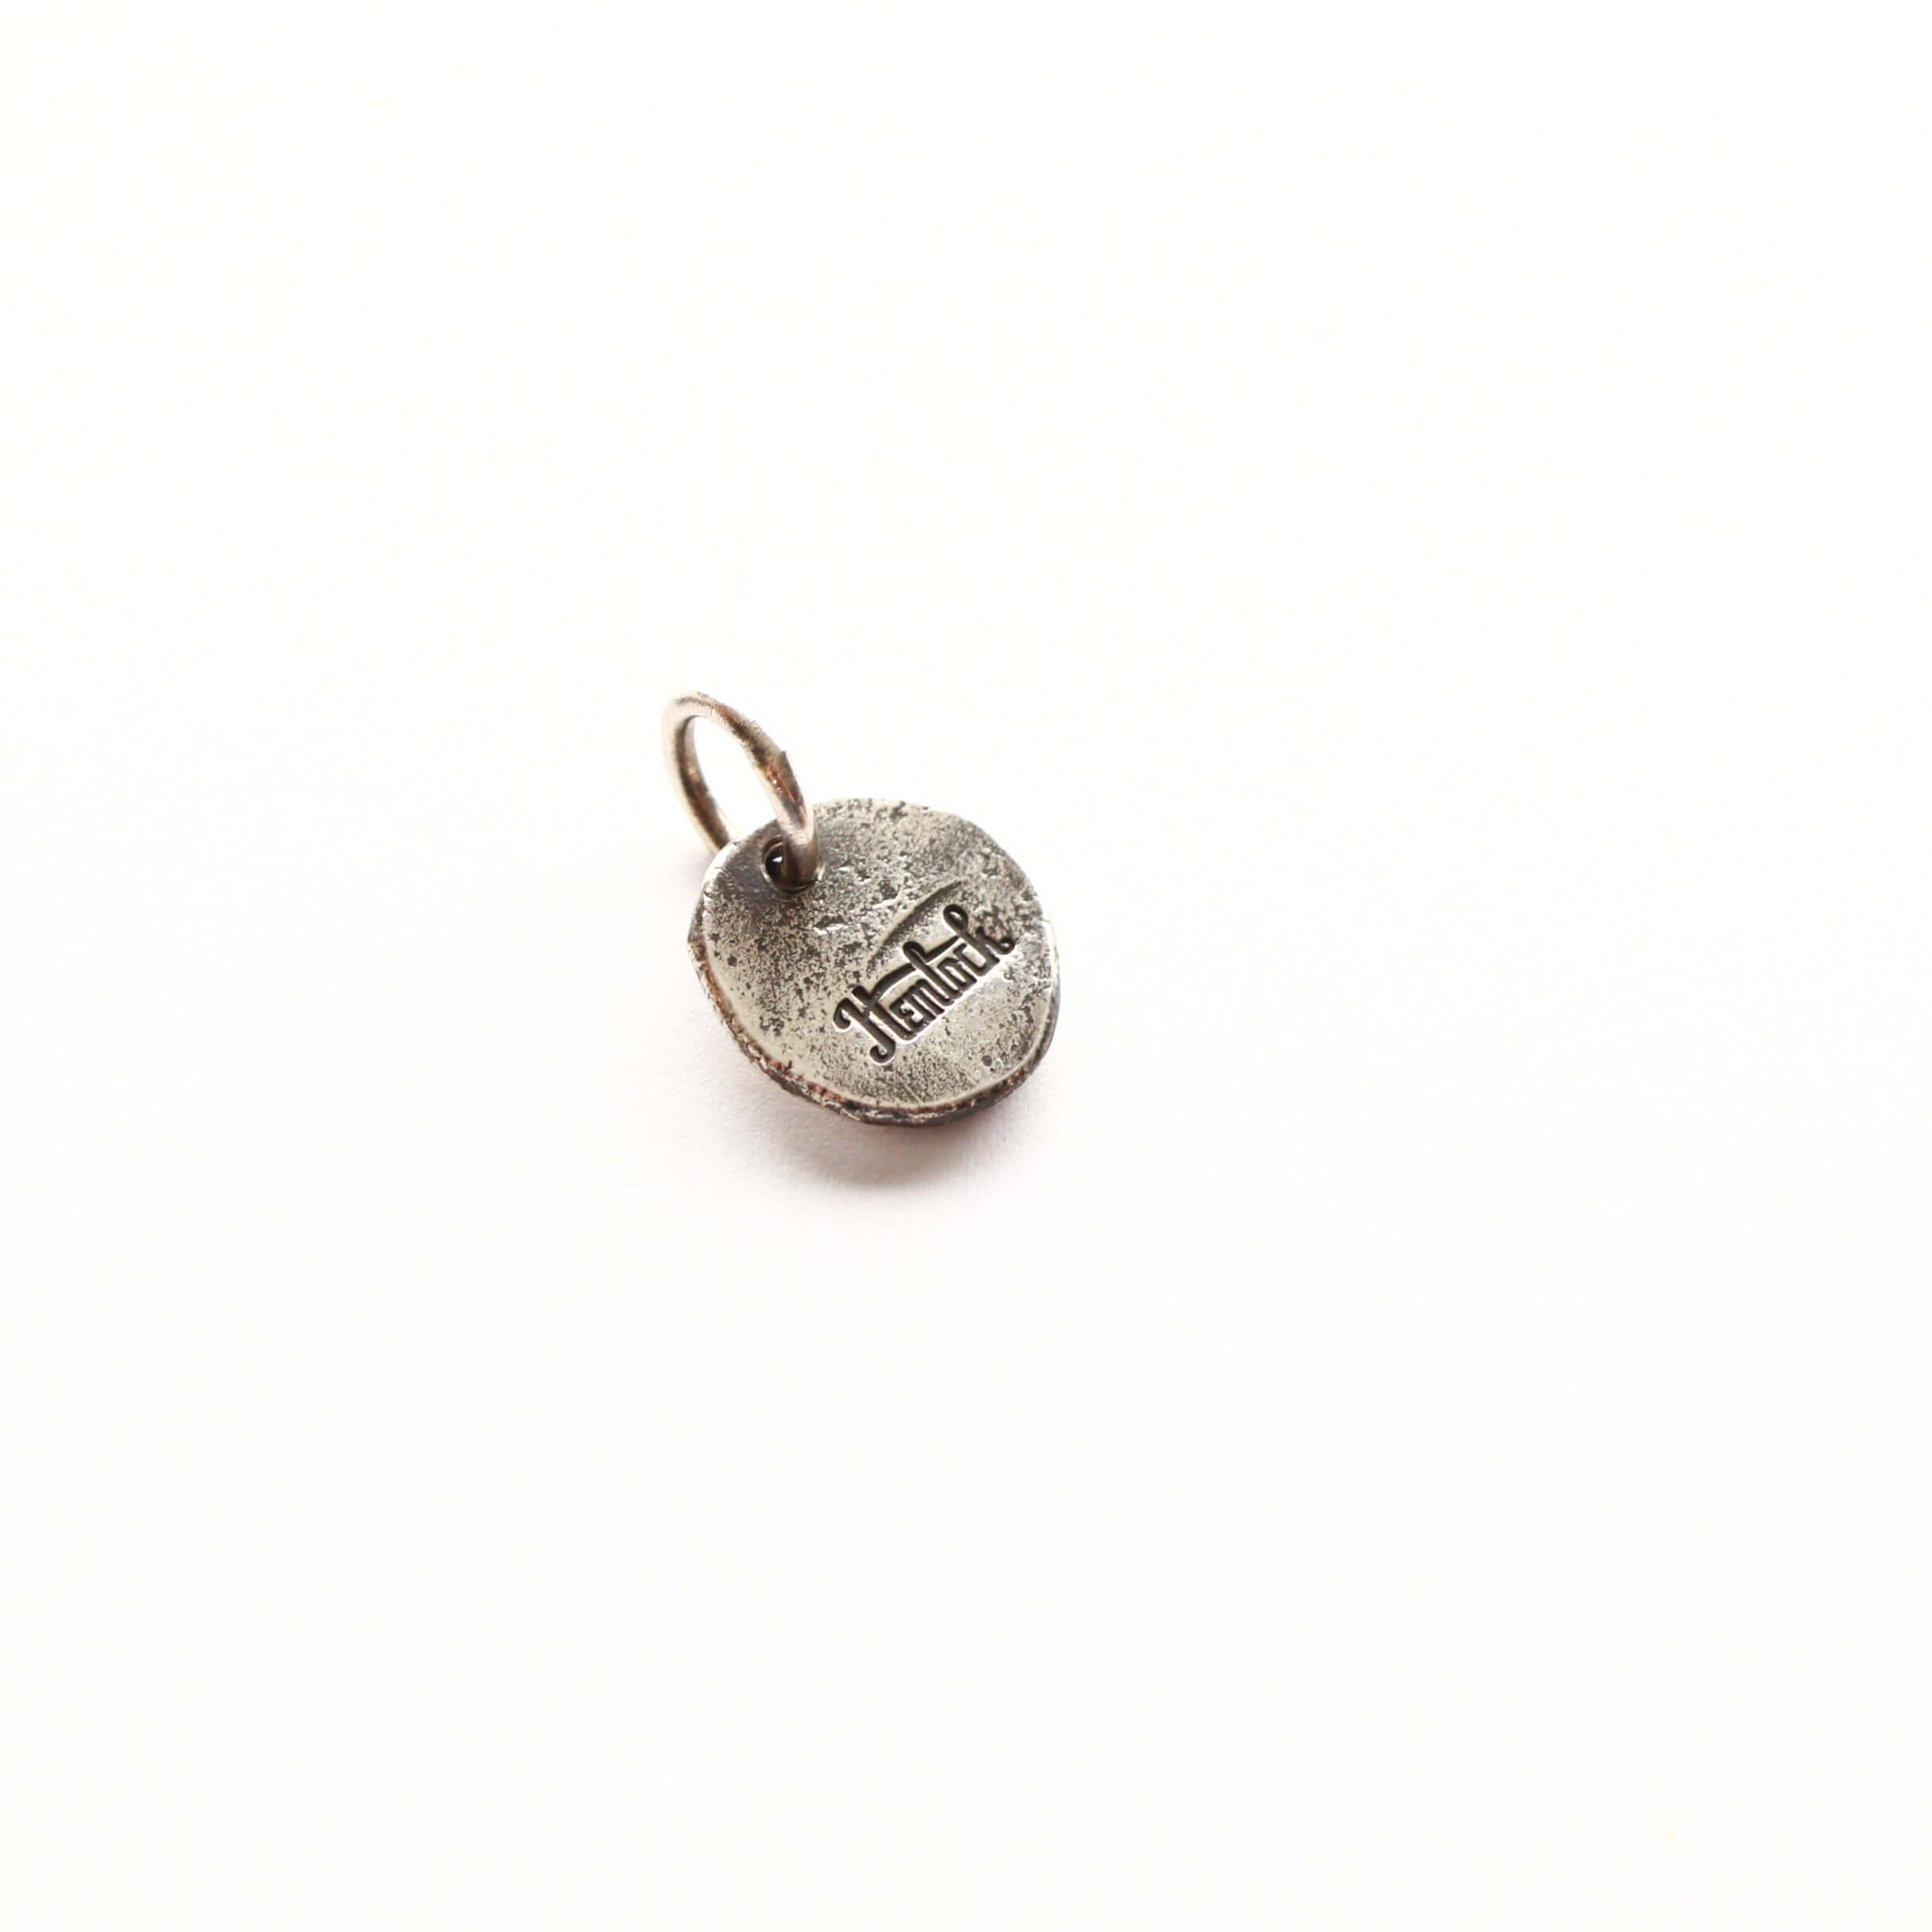 hemlock ヘムロック H circle logo metal ロゴ メタル トップ